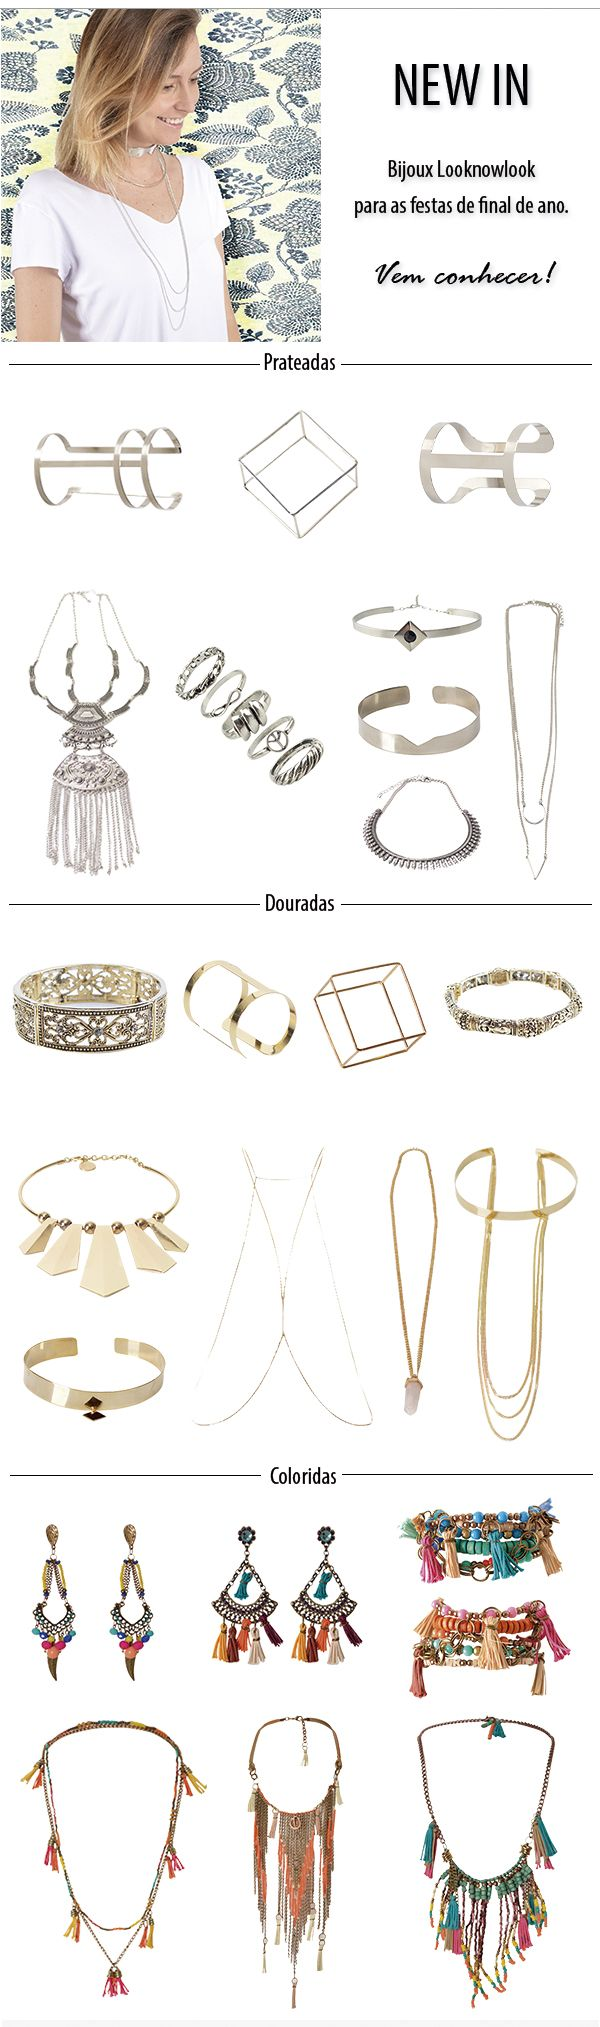 Get the Look - Bijoux   Acessórios Looknowlook Get the Look   Jessica Alba #moda #look #acessórios #bijoux #gipsy #boho #minimalista #getthelook #inspiração #looknowlook